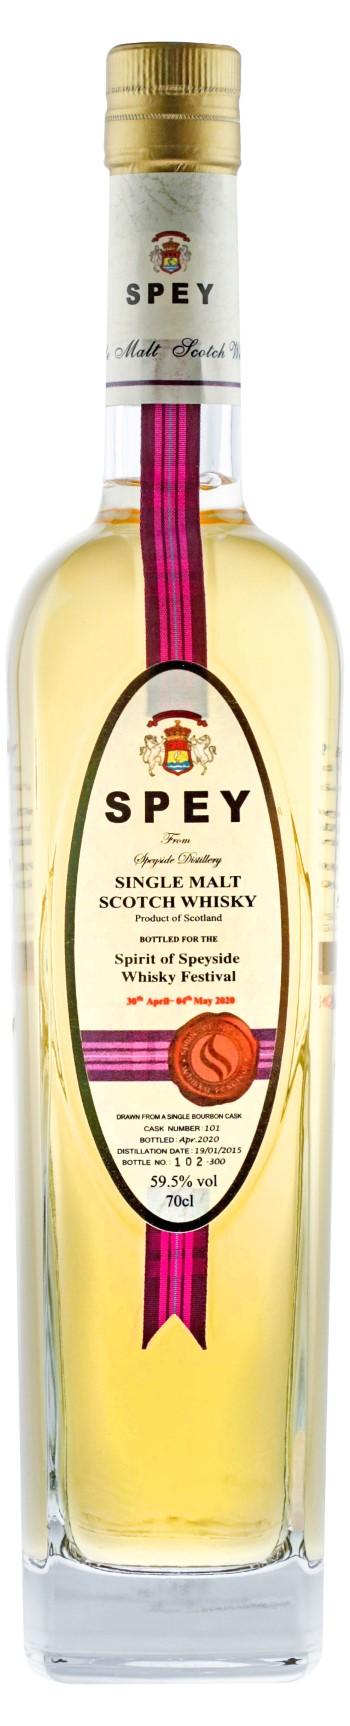 Best Scottish Single Cask Single Malt